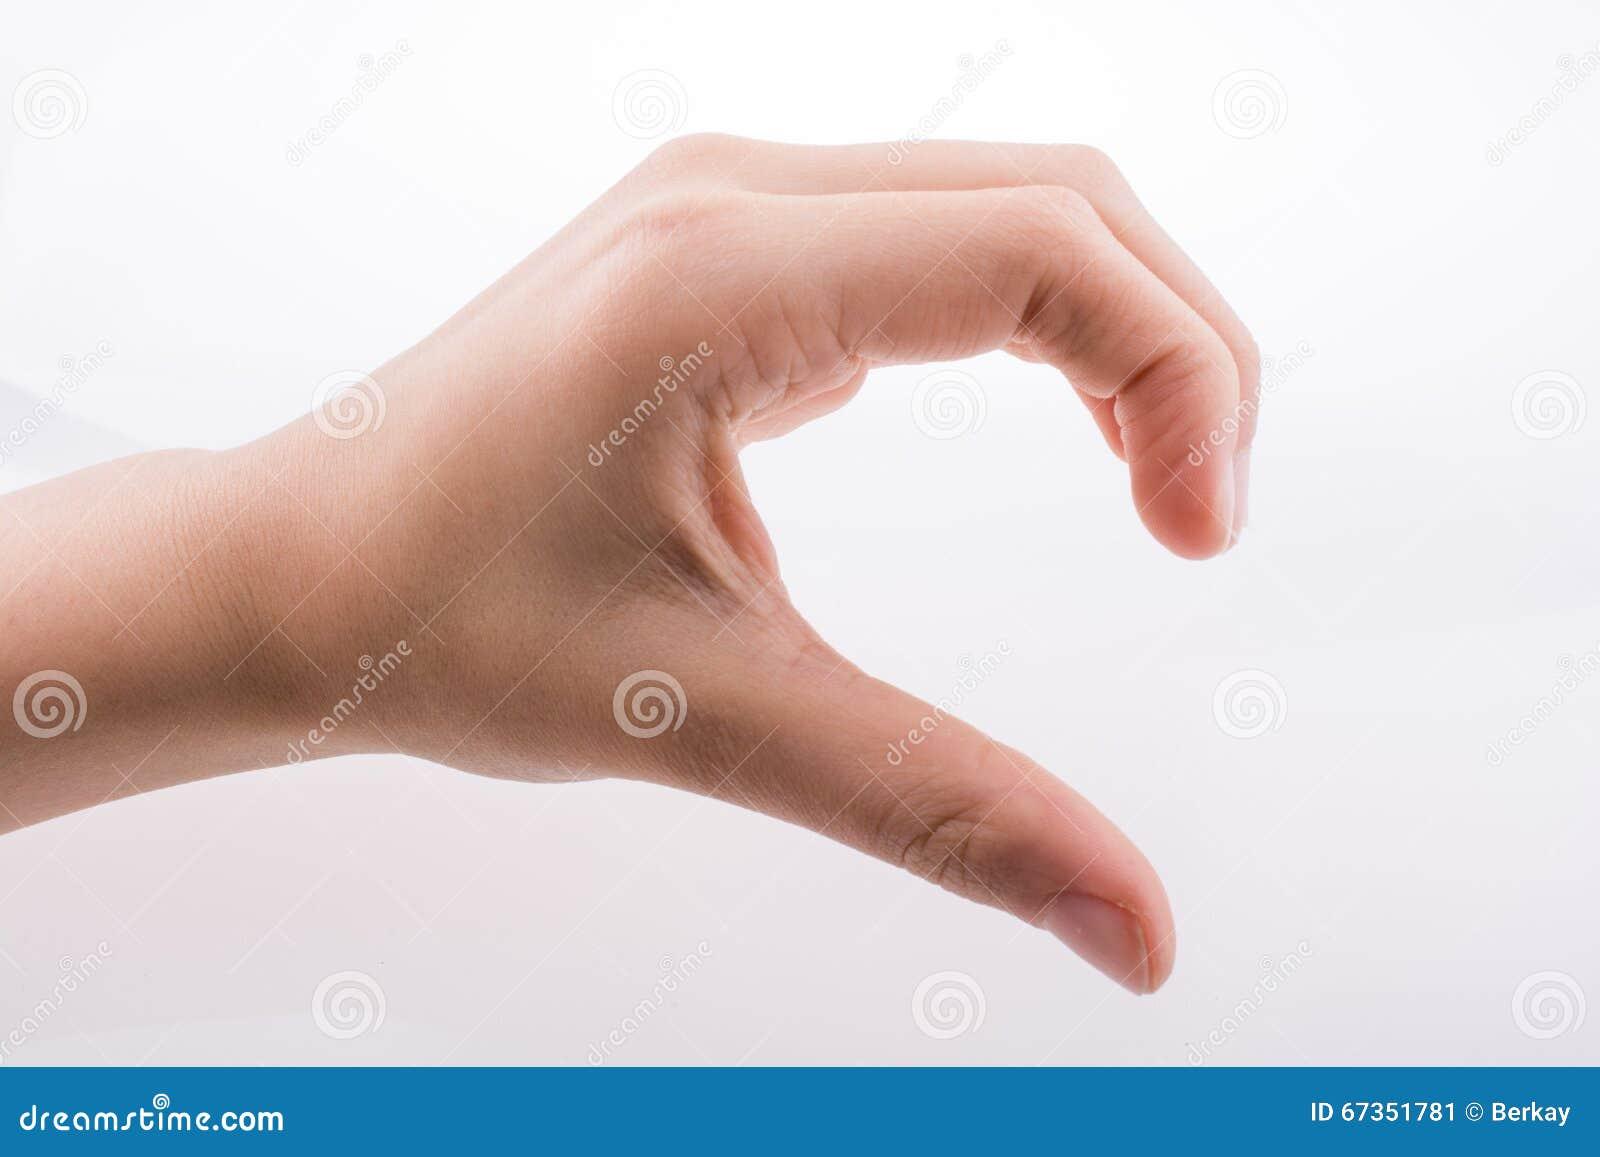 half hand heart gallery - photo #9